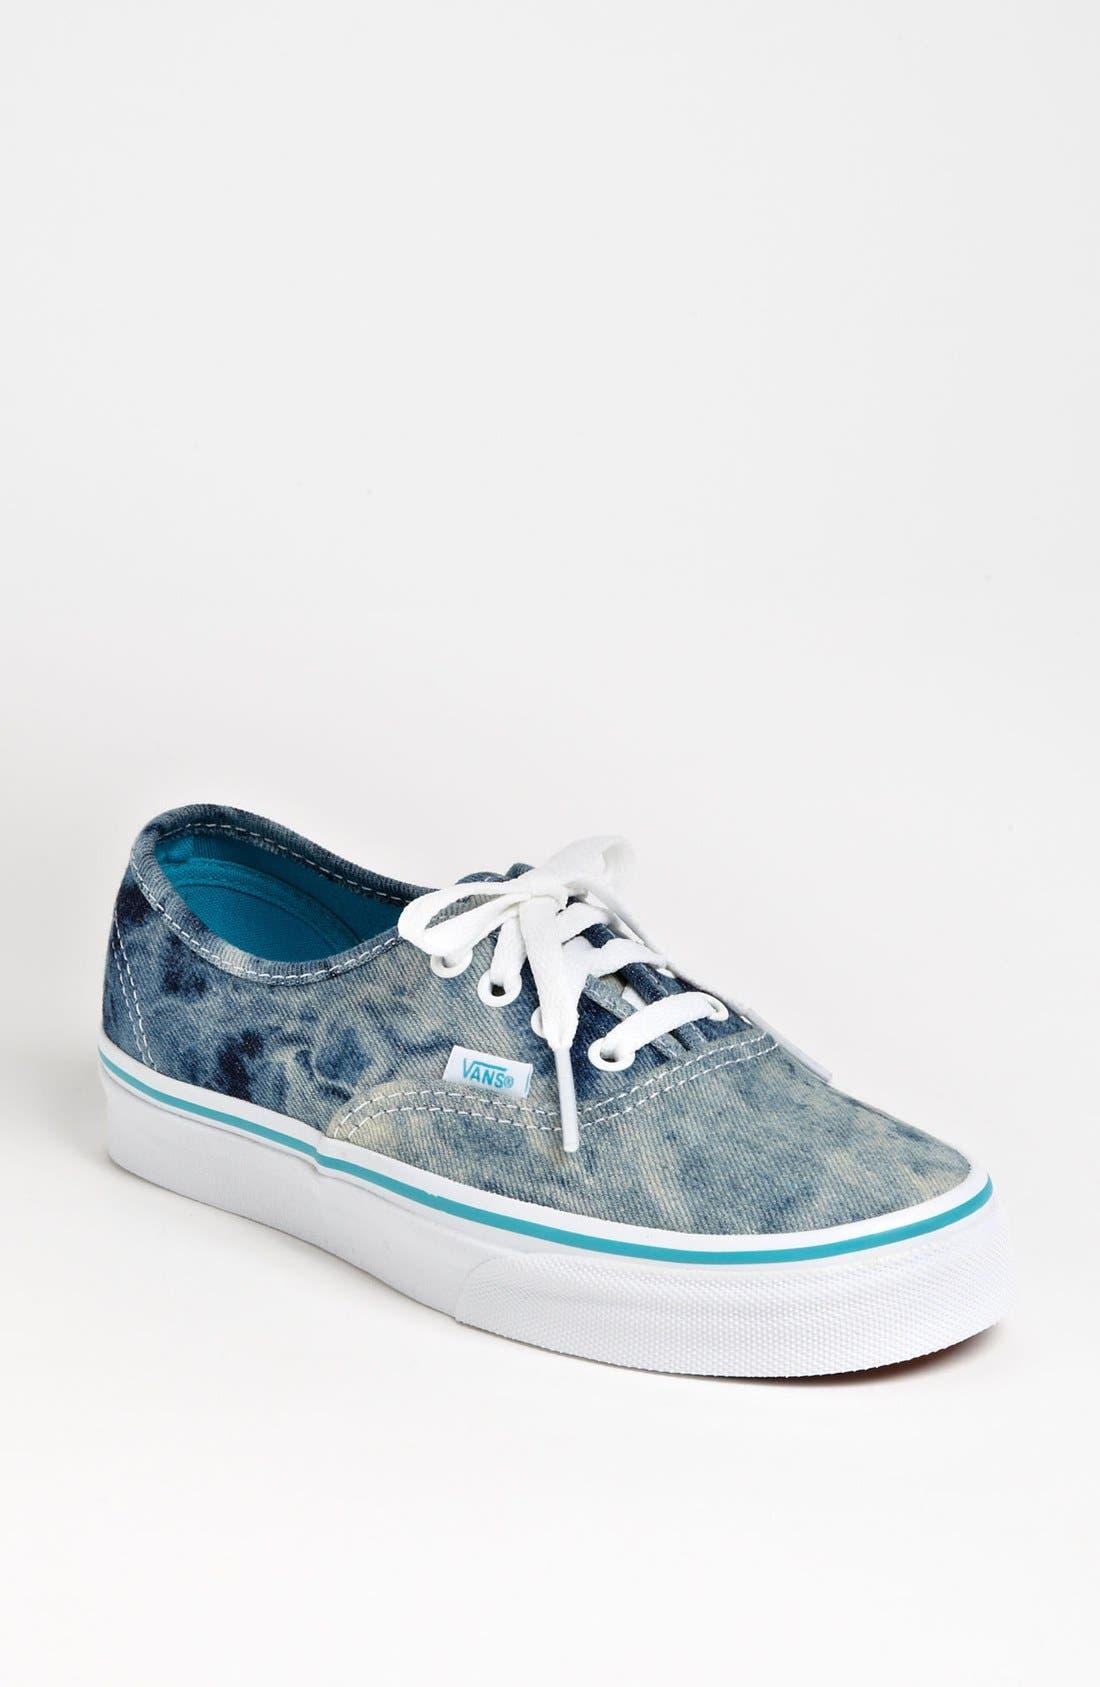 Alternate Image 1 Selected - Vans 'Authentic' Acid Wash Denim Sneaker